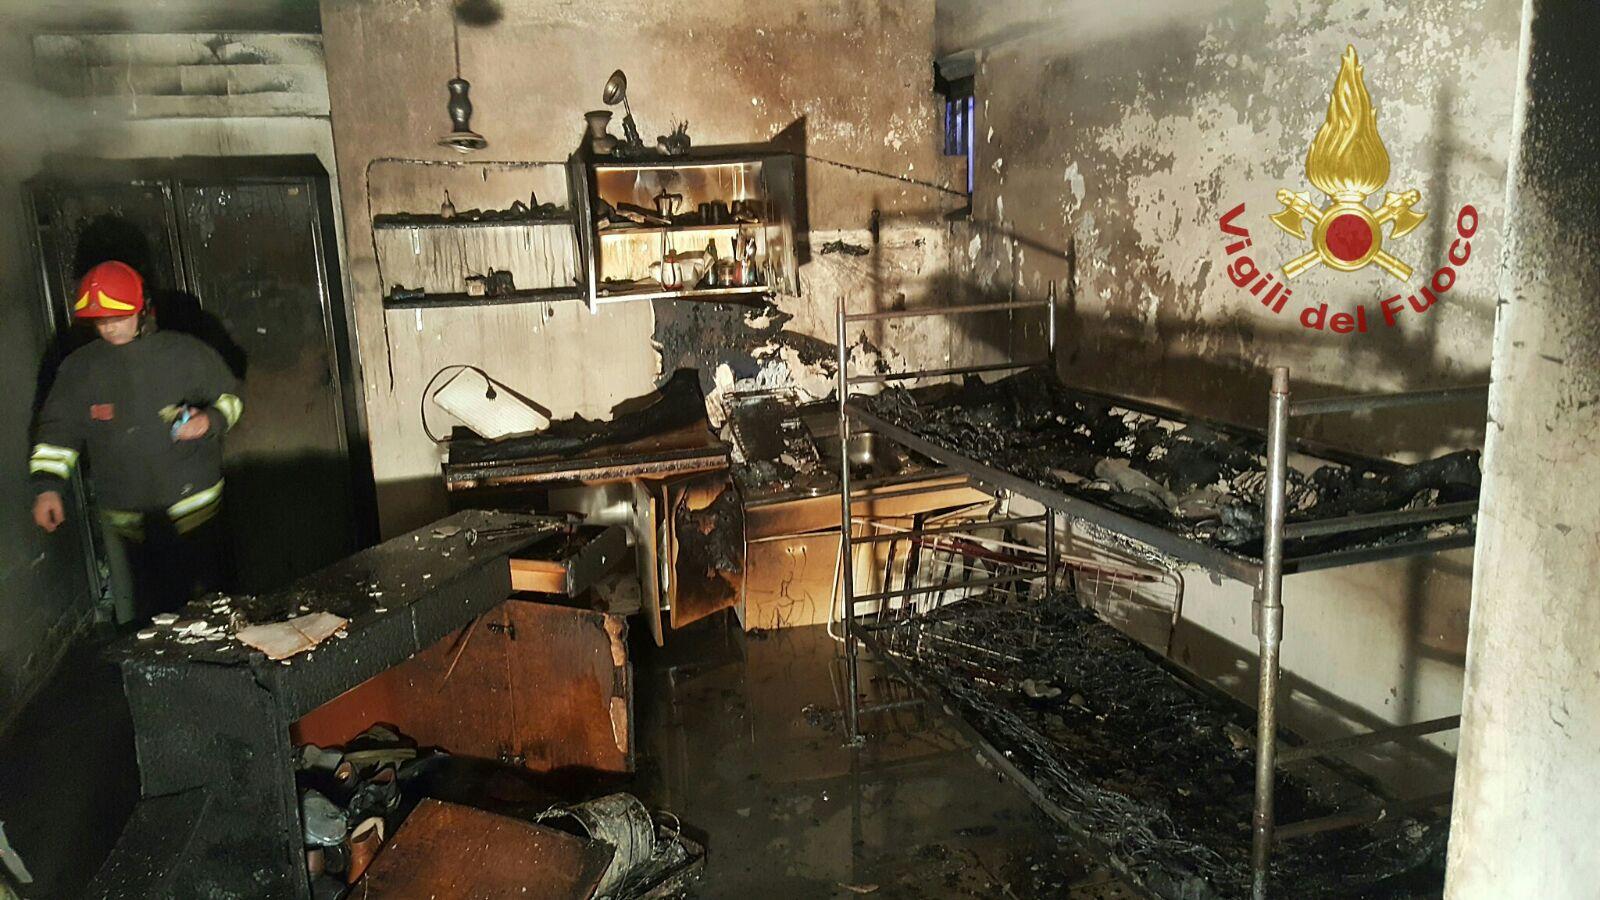 Incendio in un'abitazione, notte di paura a Rotondi